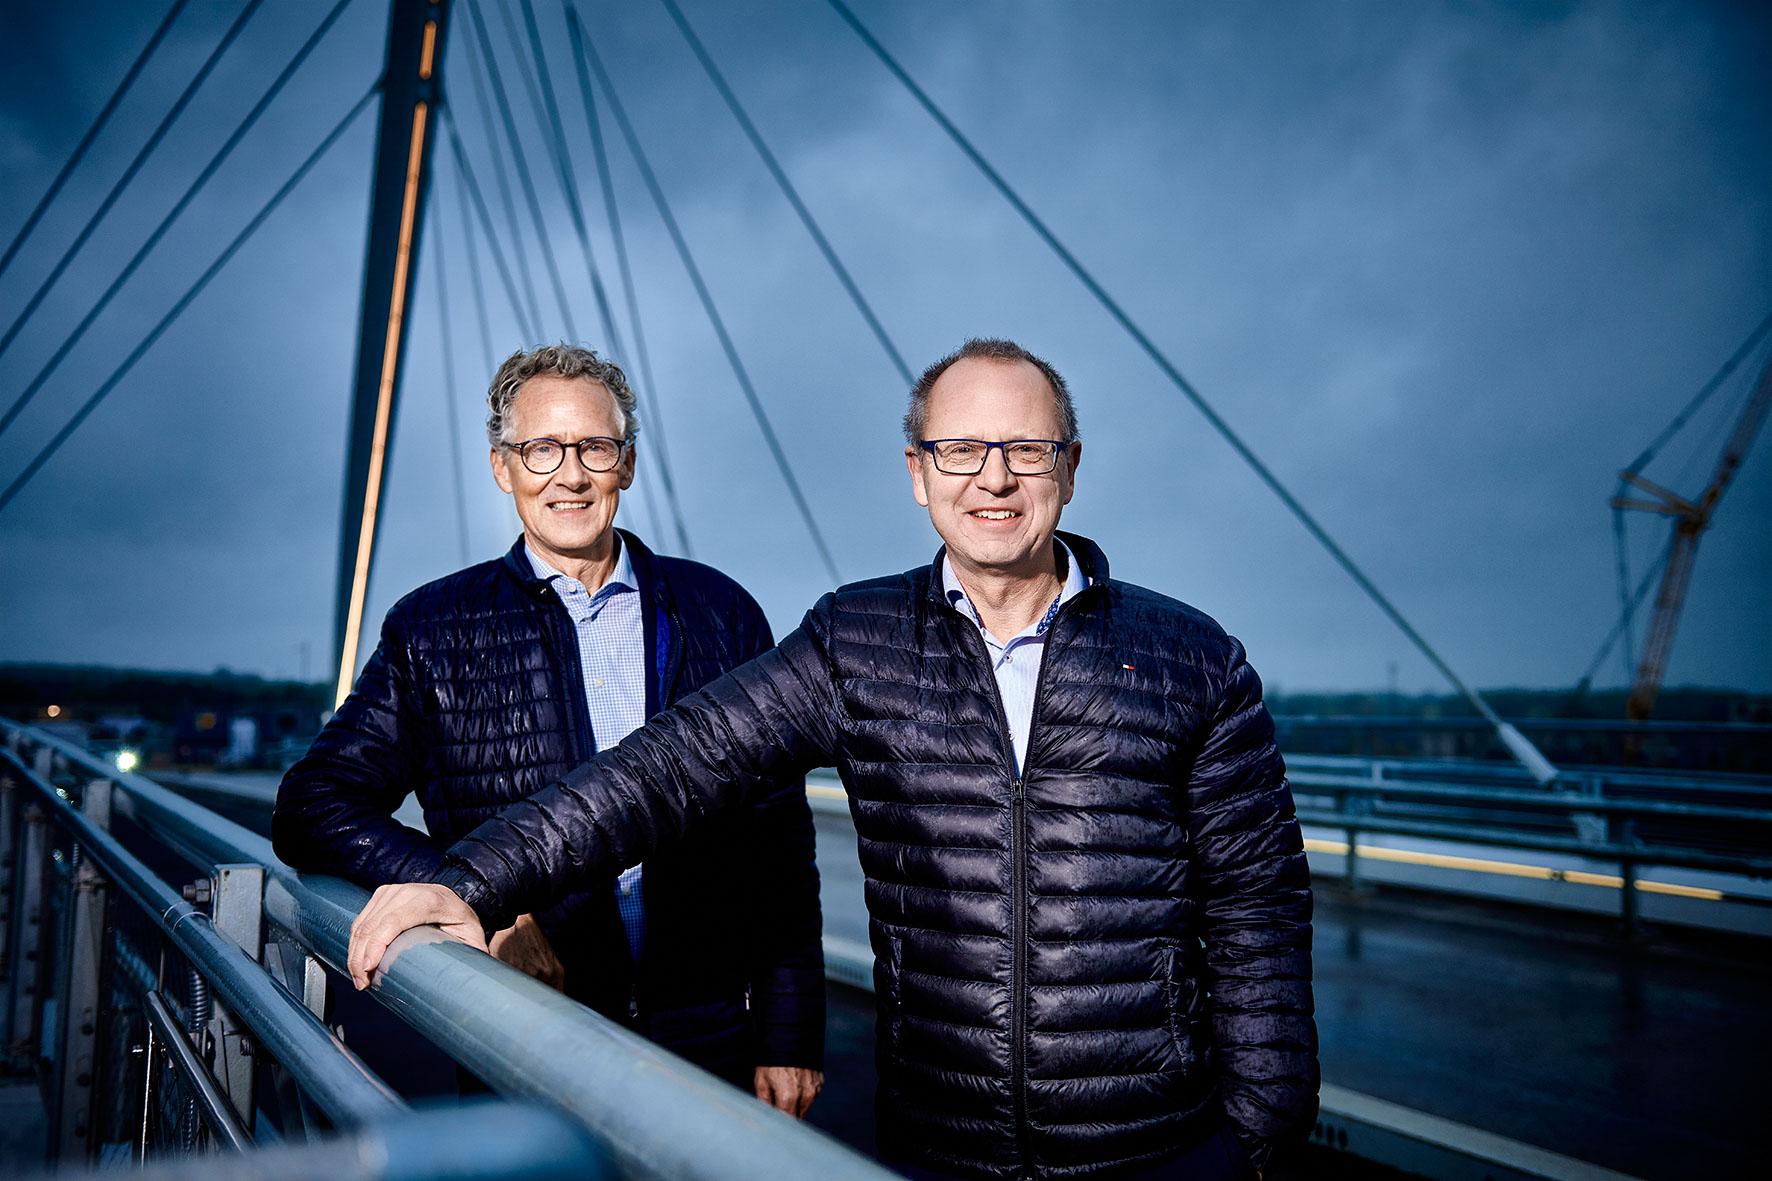 Ole Møller Naerheden Hans-Bo Hyldig FB Gruppen på Bro